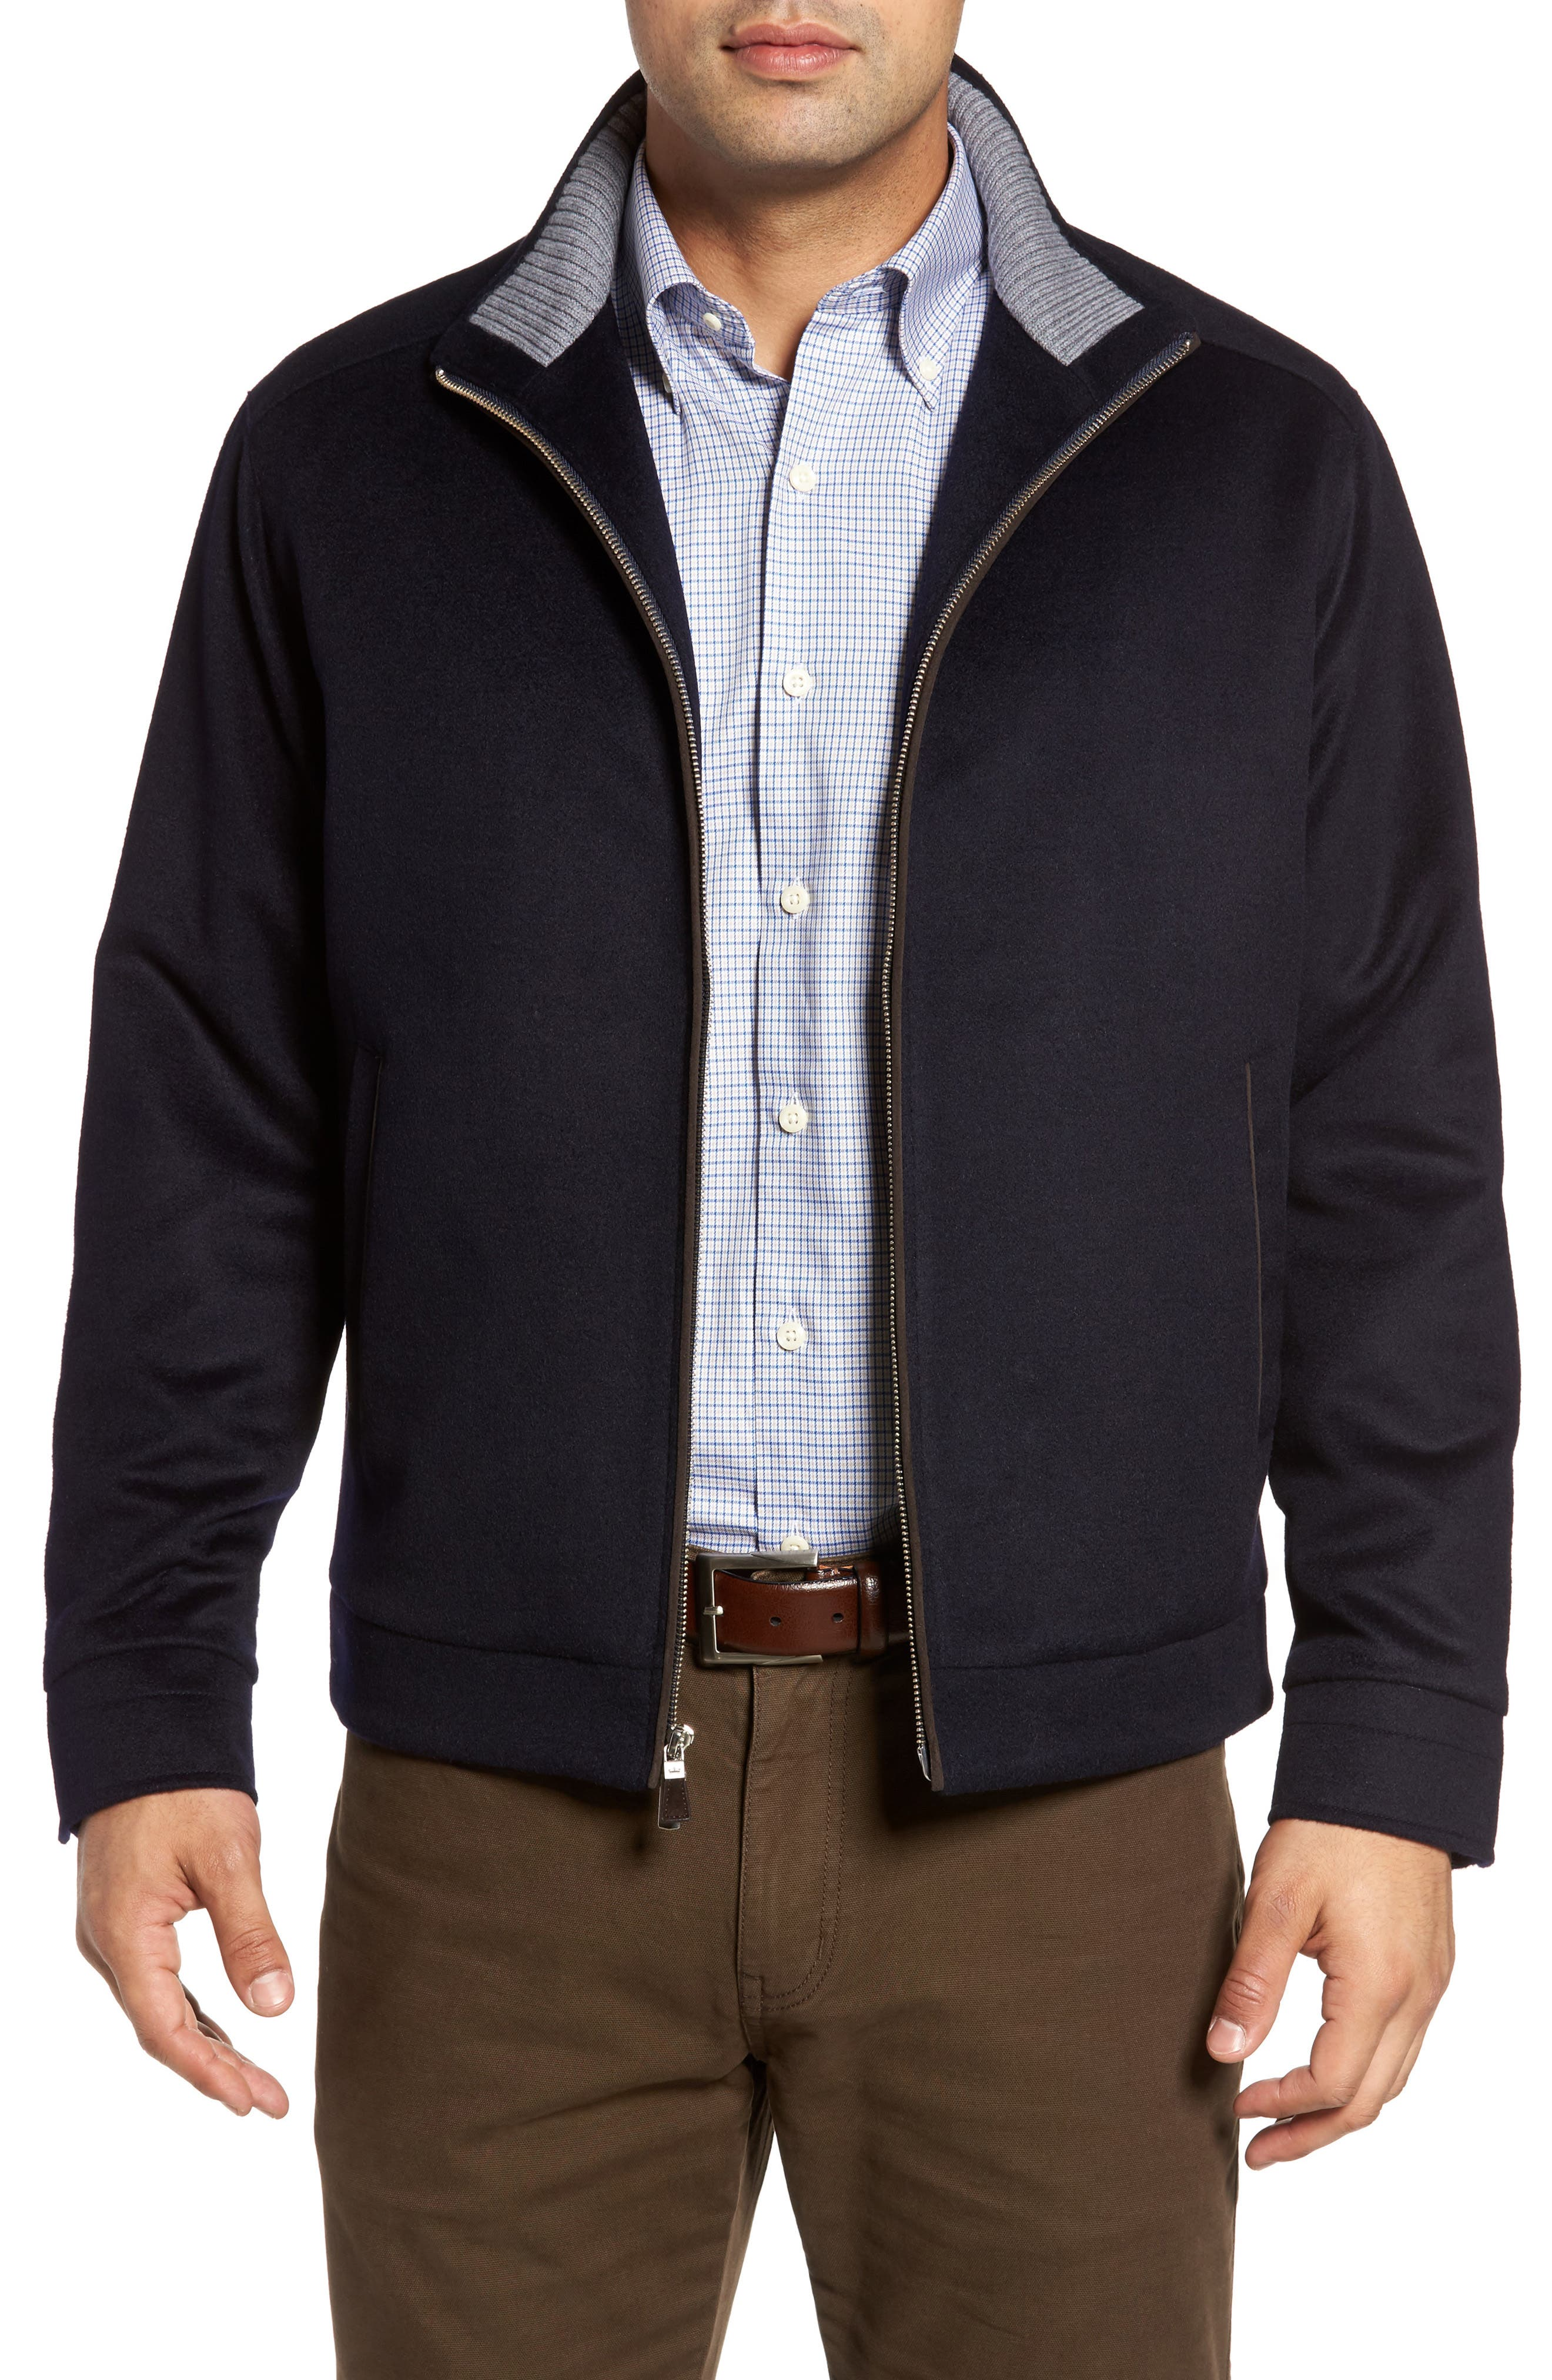 Alternate Image 1 Selected - Peter Millar Westport Wool & Cashmere Jacket